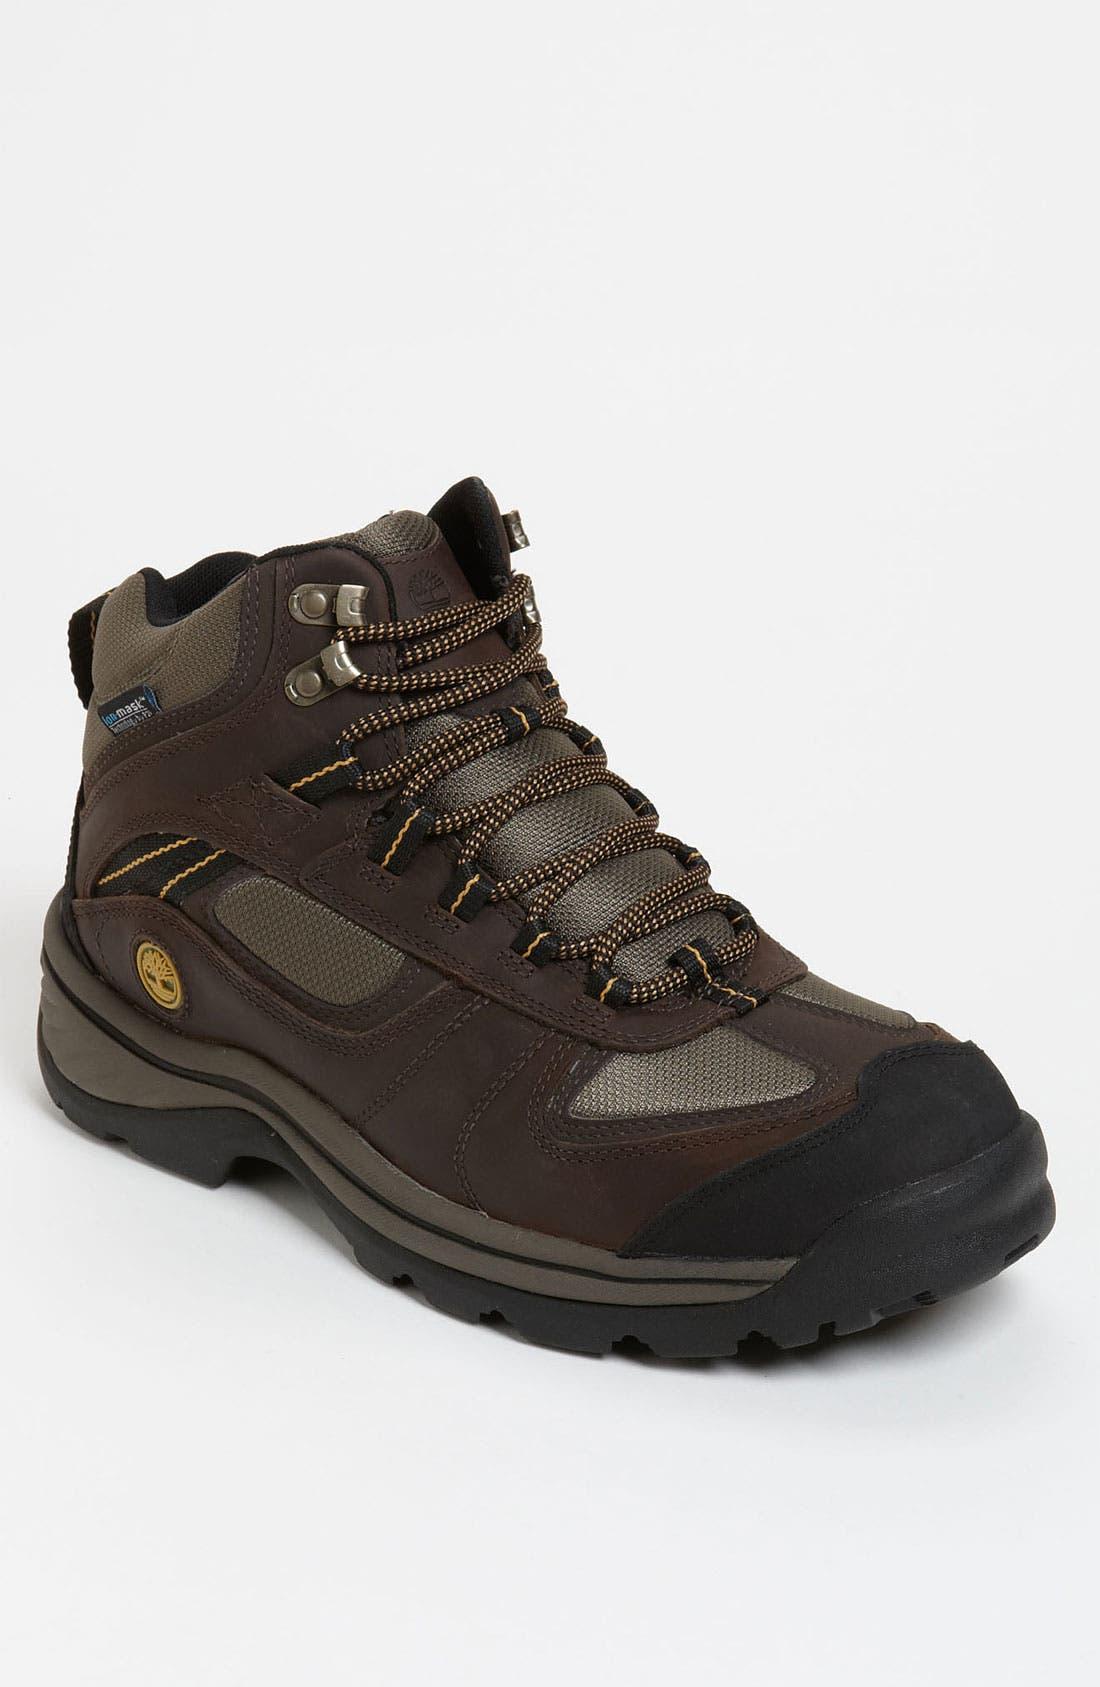 Alternate Image 1 Selected - Timberland 'Chochorua Trail FTP' Hiking Boot (Men)